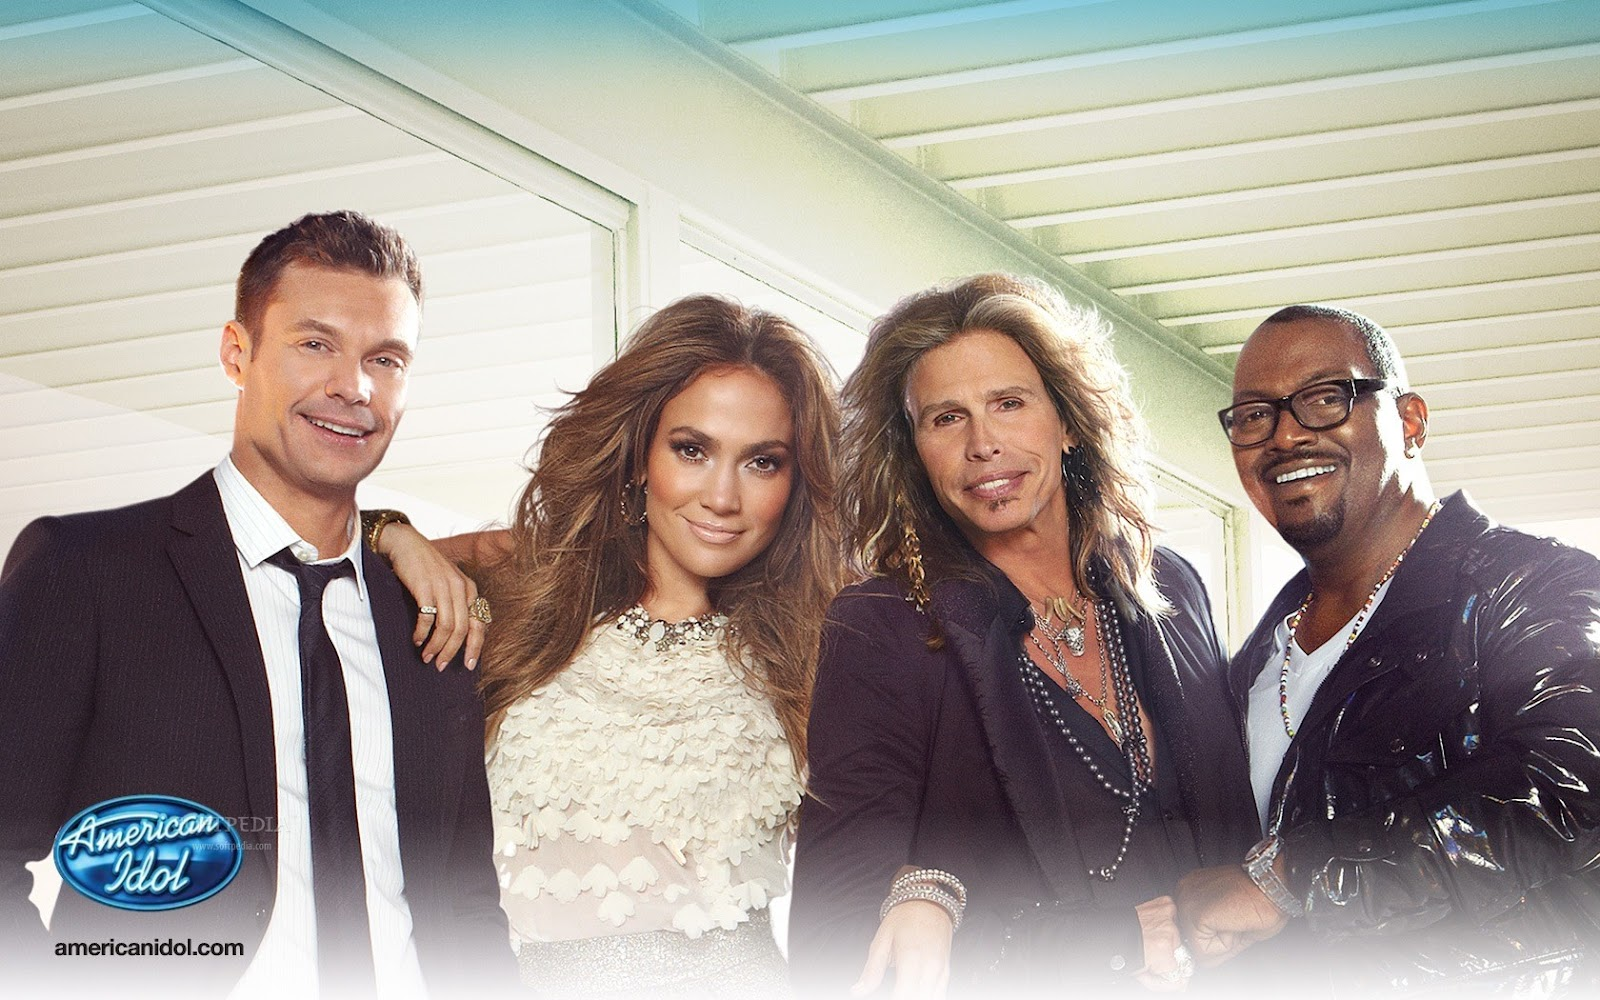 http://1.bp.blogspot.com/-5DJK2inEcXw/T0zvMTit4JI/AAAAAAAAAss/hBArS047aCc/s1600/American-Idol-Judges_1.jpg